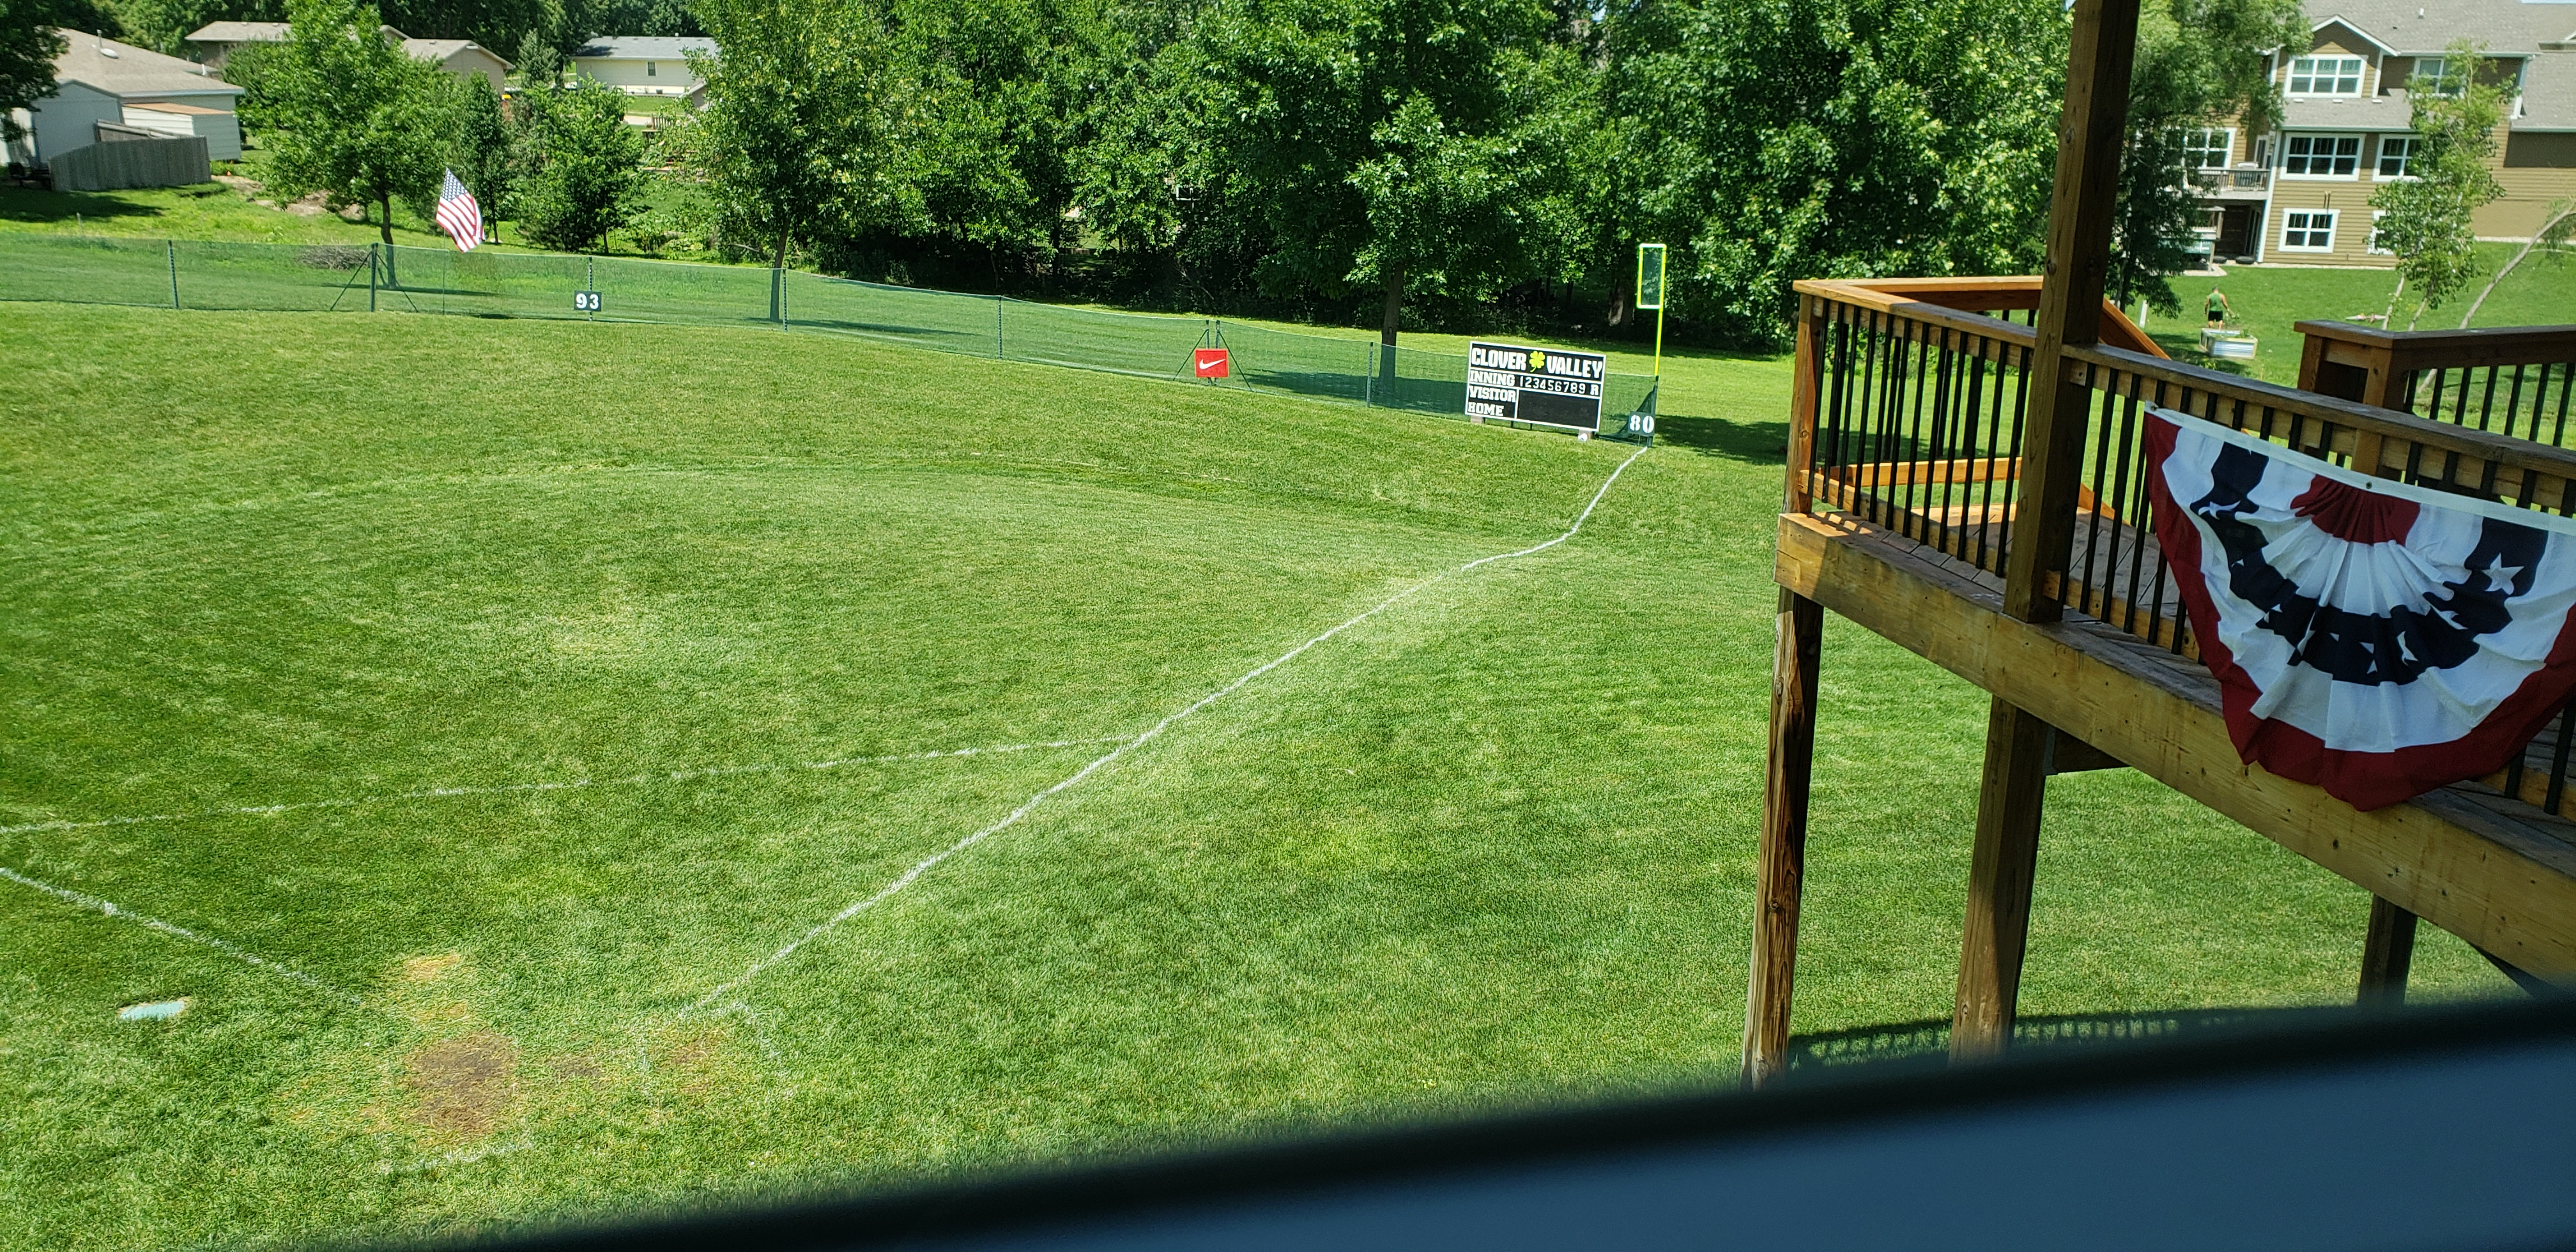 clover-wiffle-ball-field-2.jpg